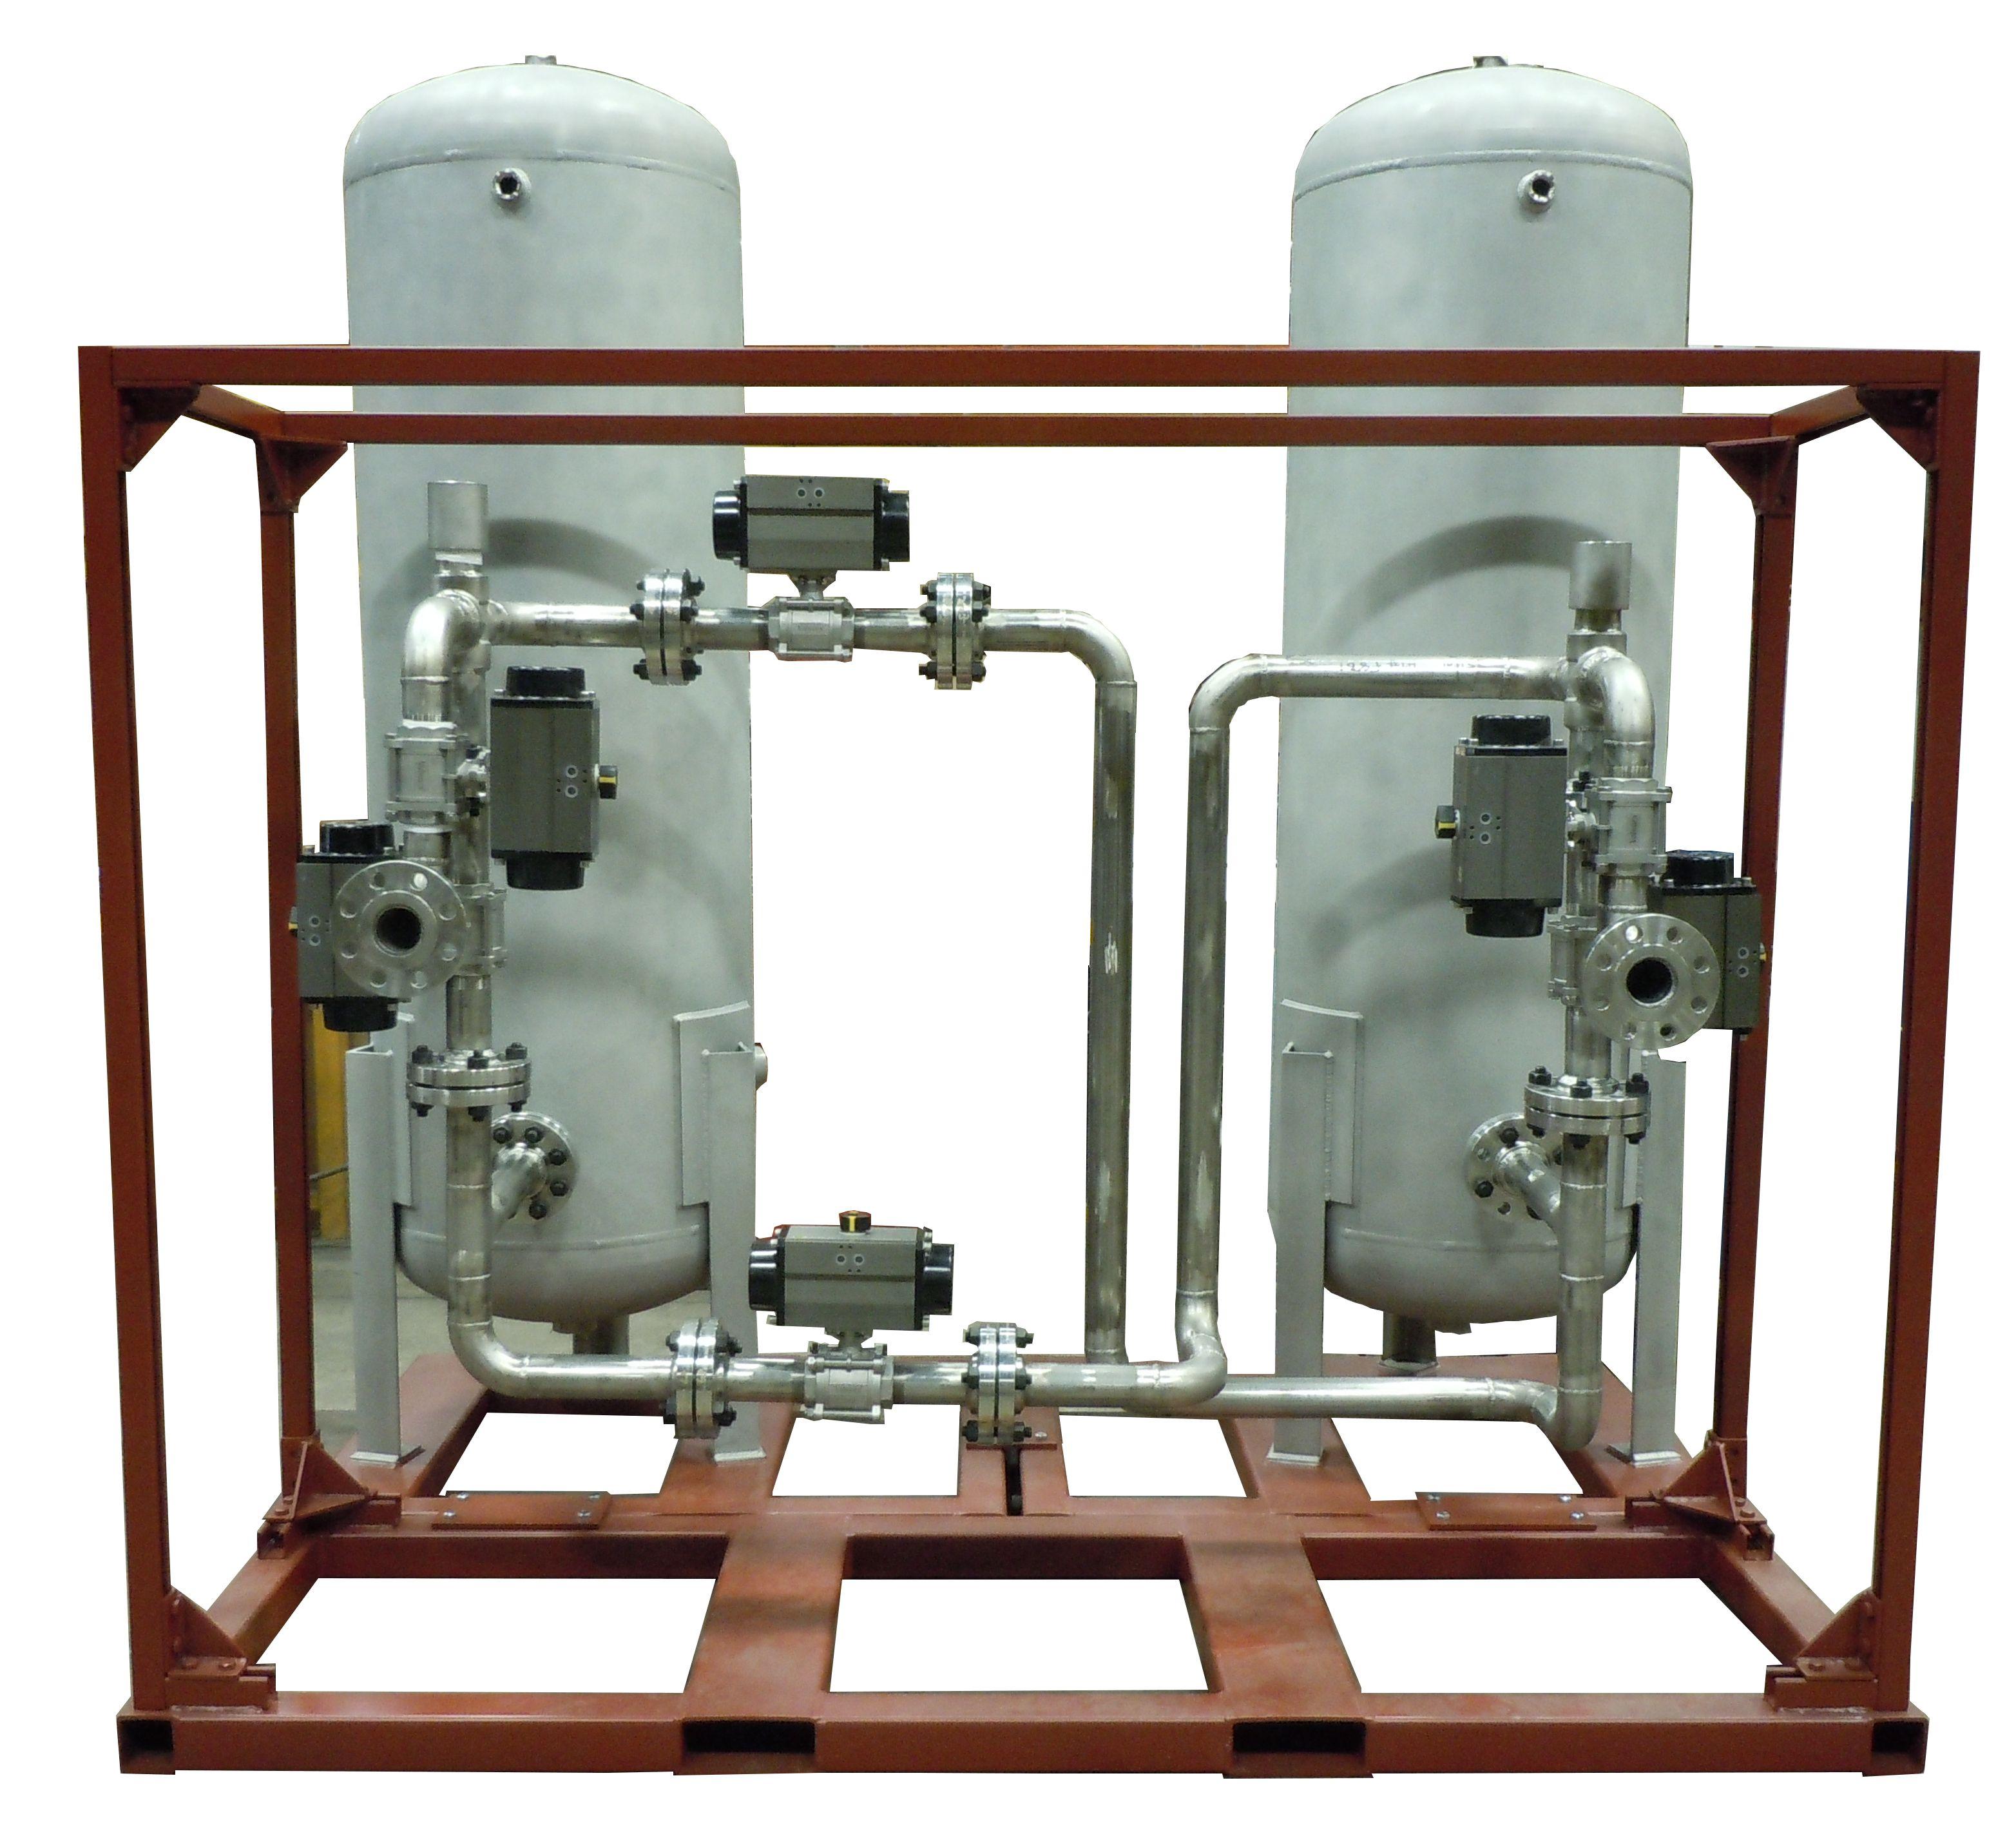 Pressure Vessel Skid BEPeterson Pressure Vessels